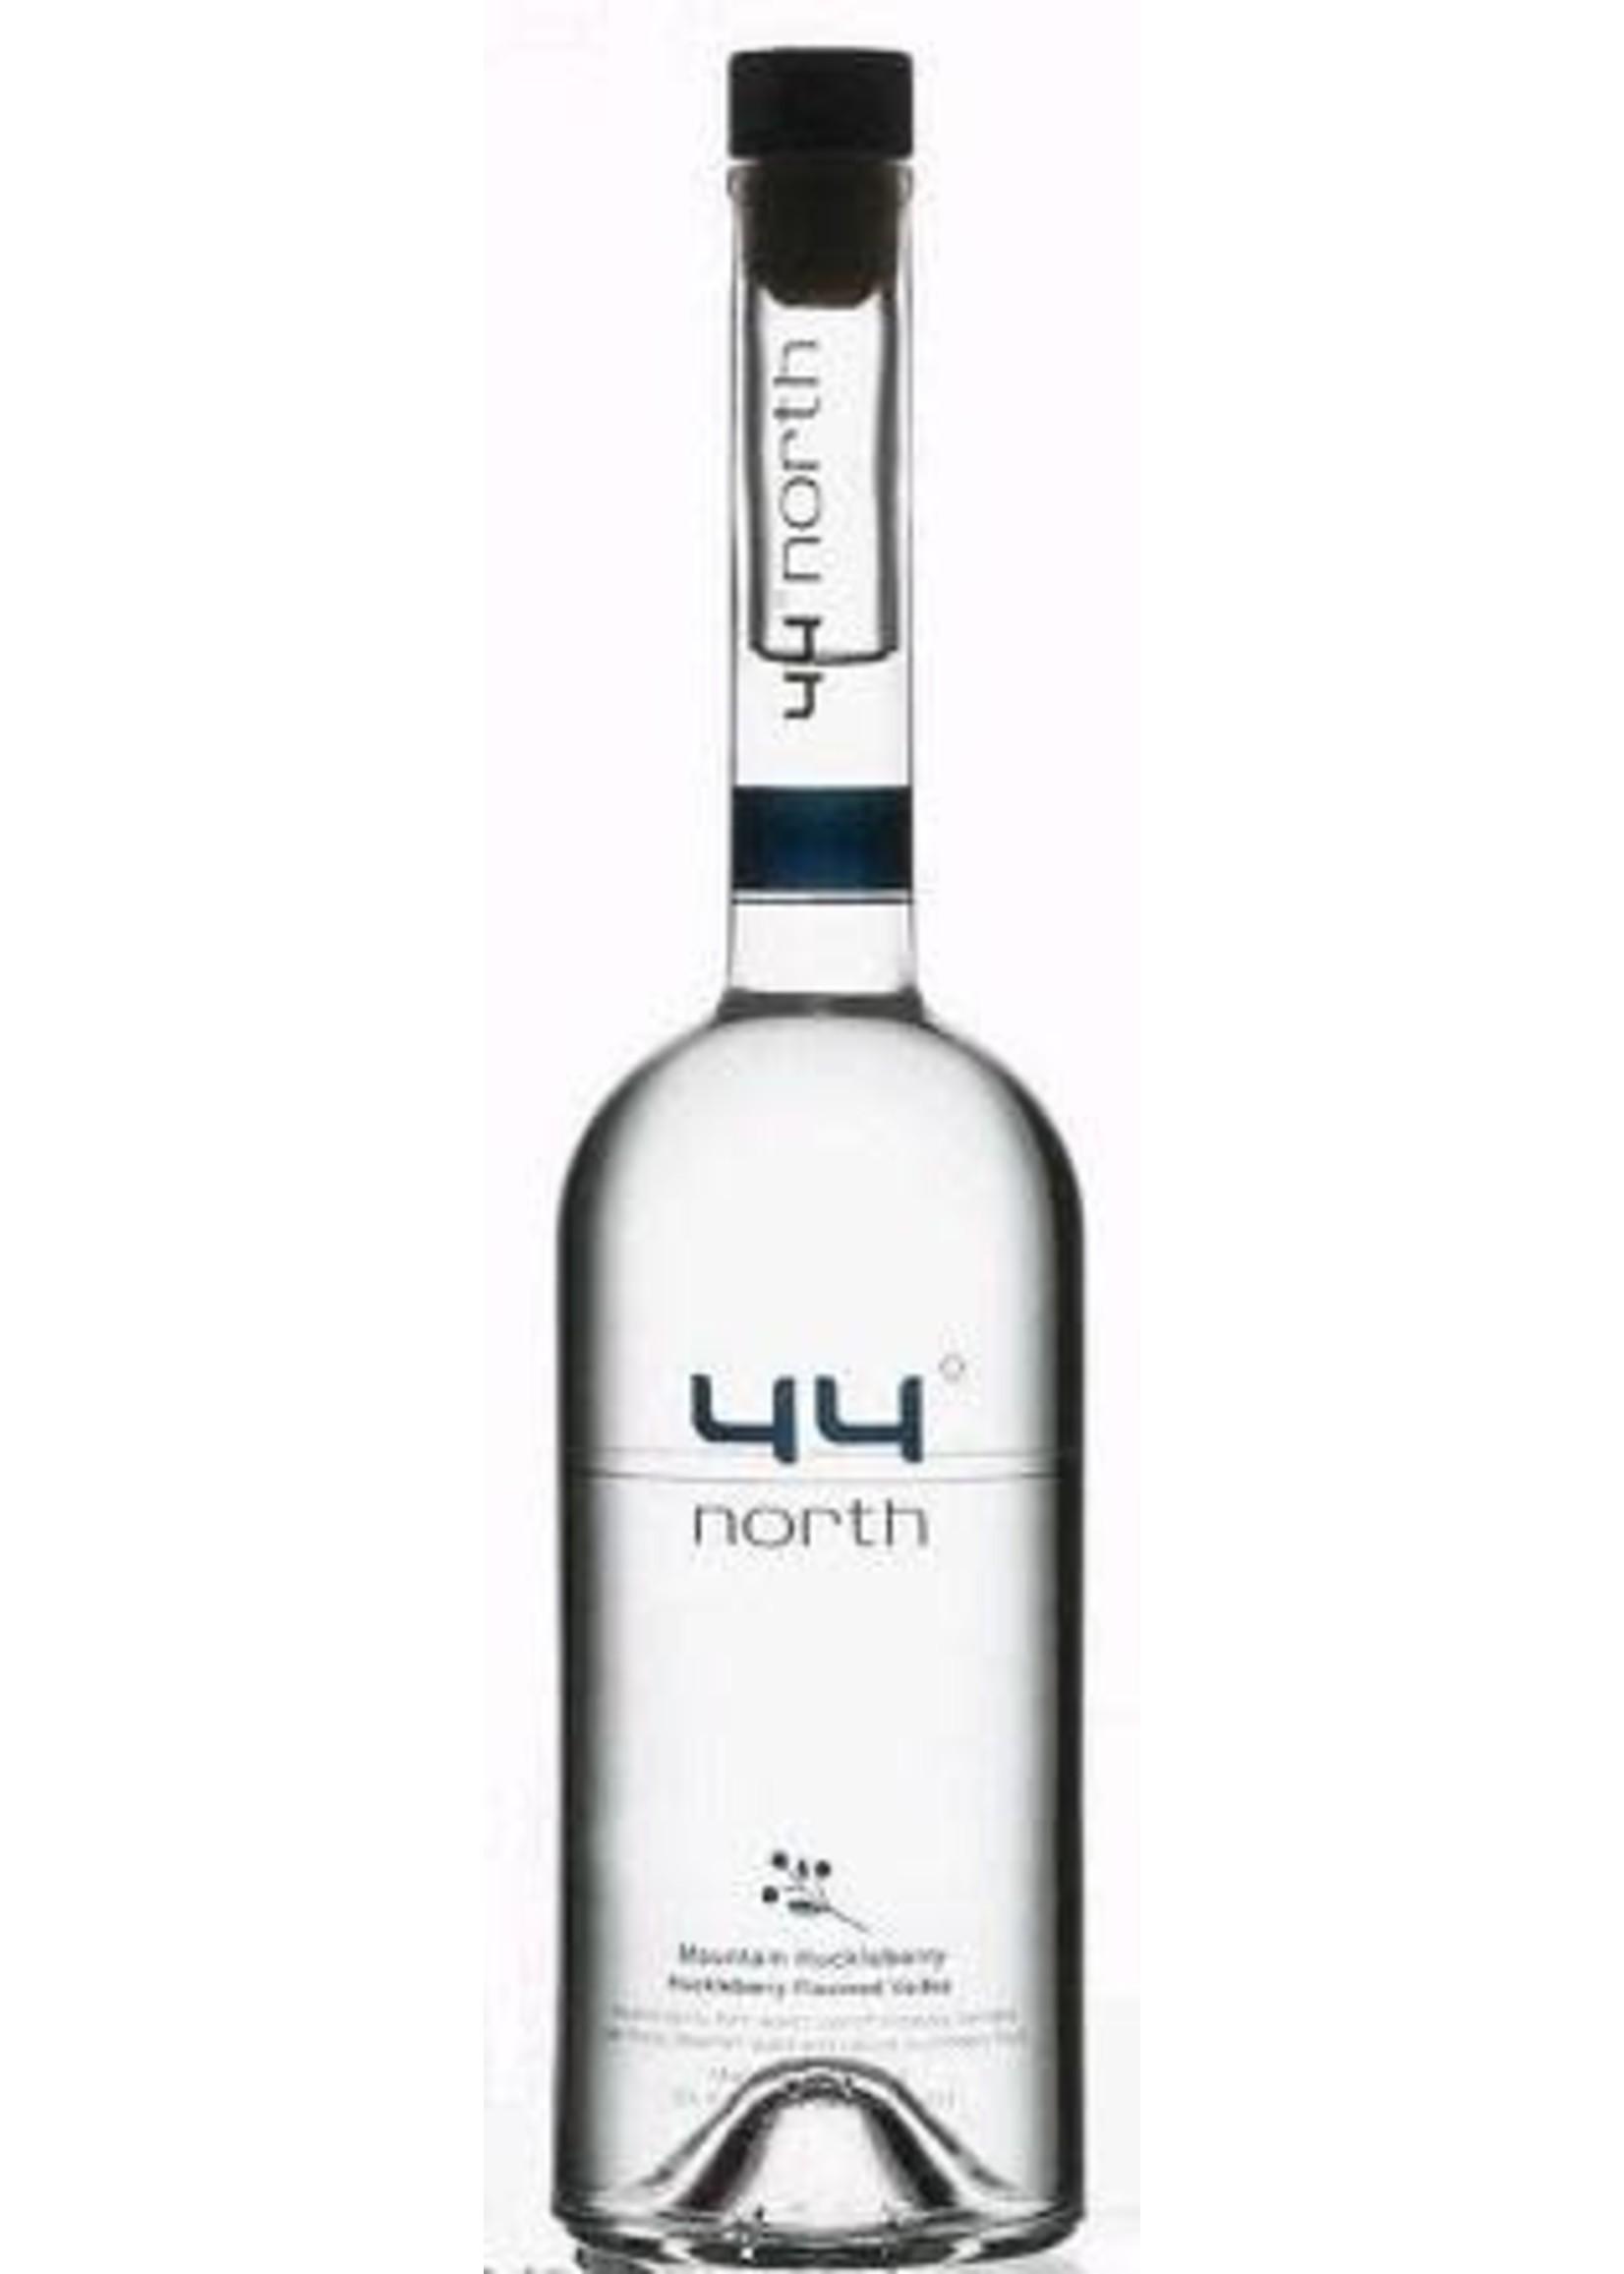 44 Degrees North 44 Degrees North / Huckleberry Vodka / 750mL